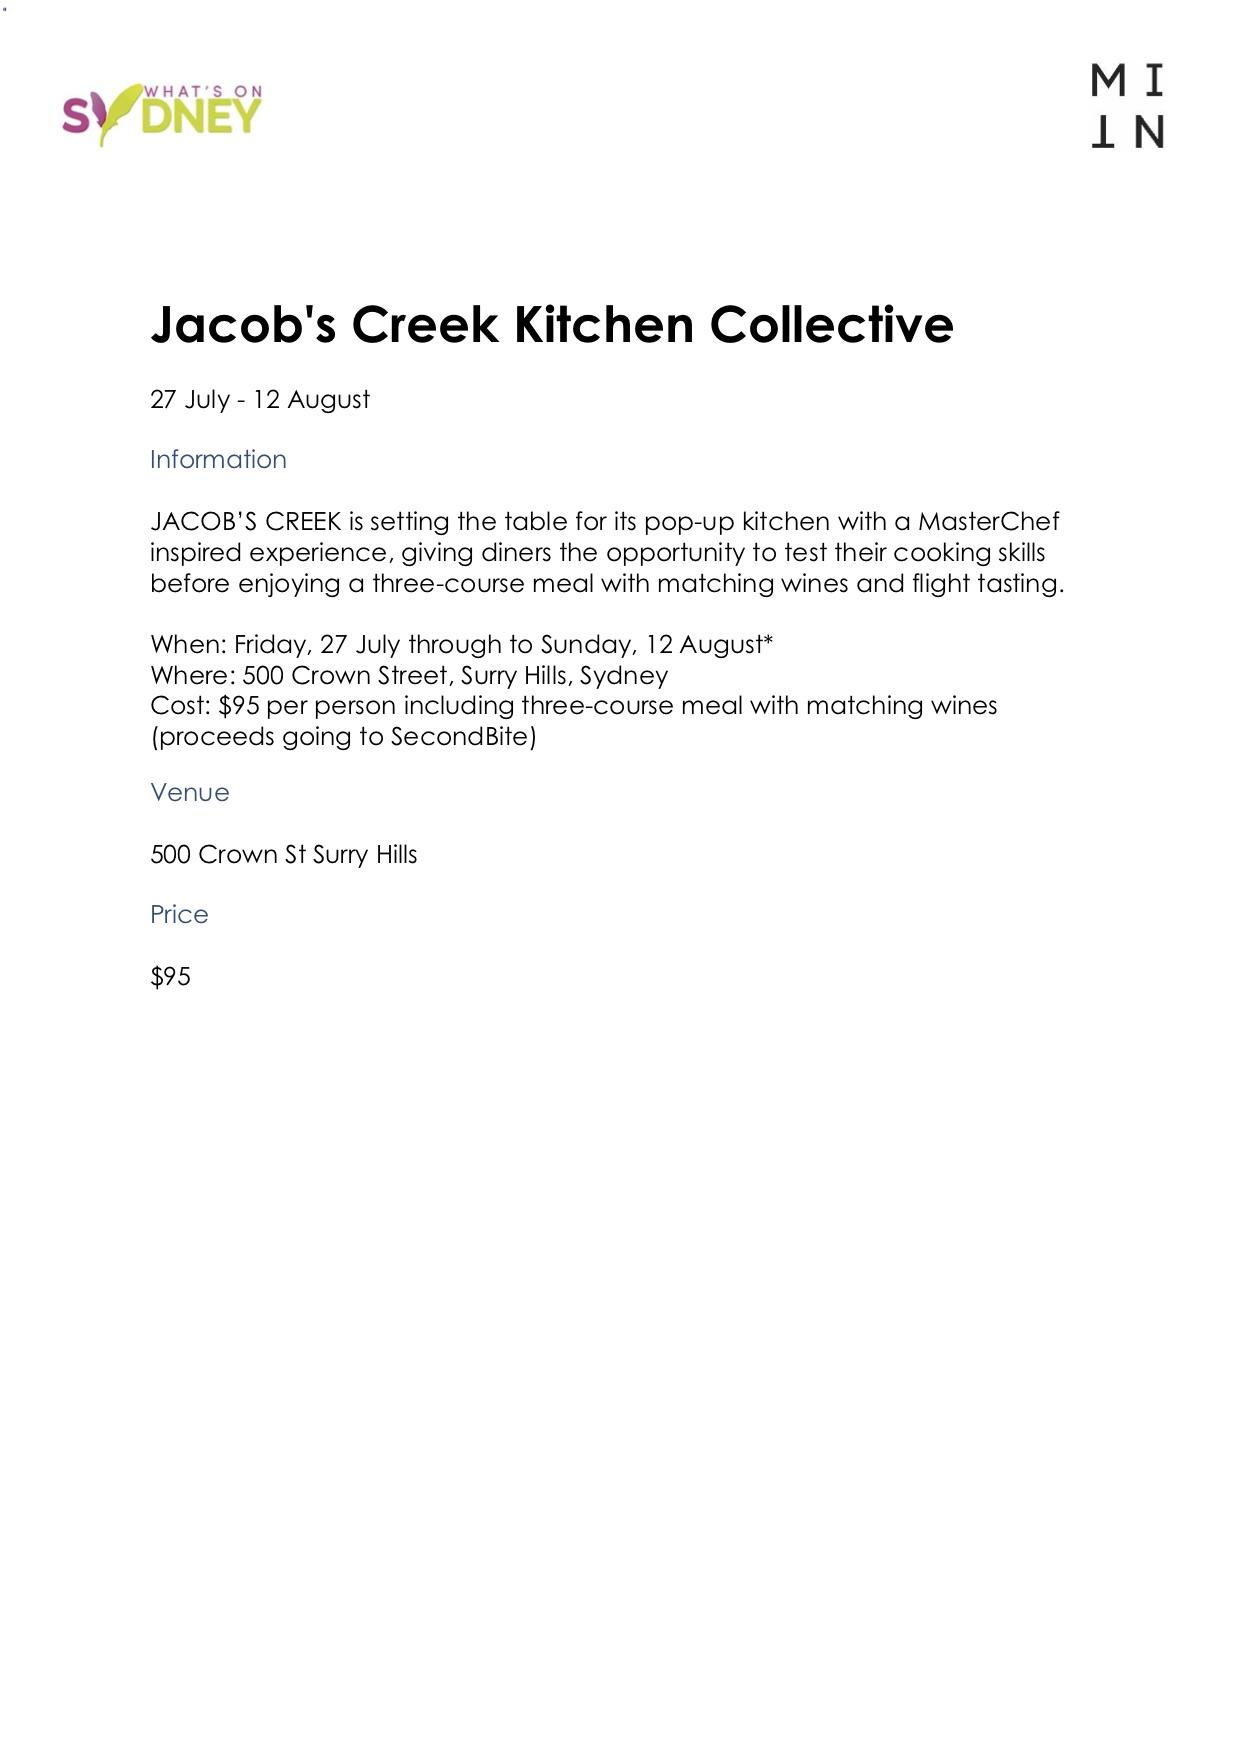 20180728 www.whatsonsydney.com Jacob's Creek.jpg